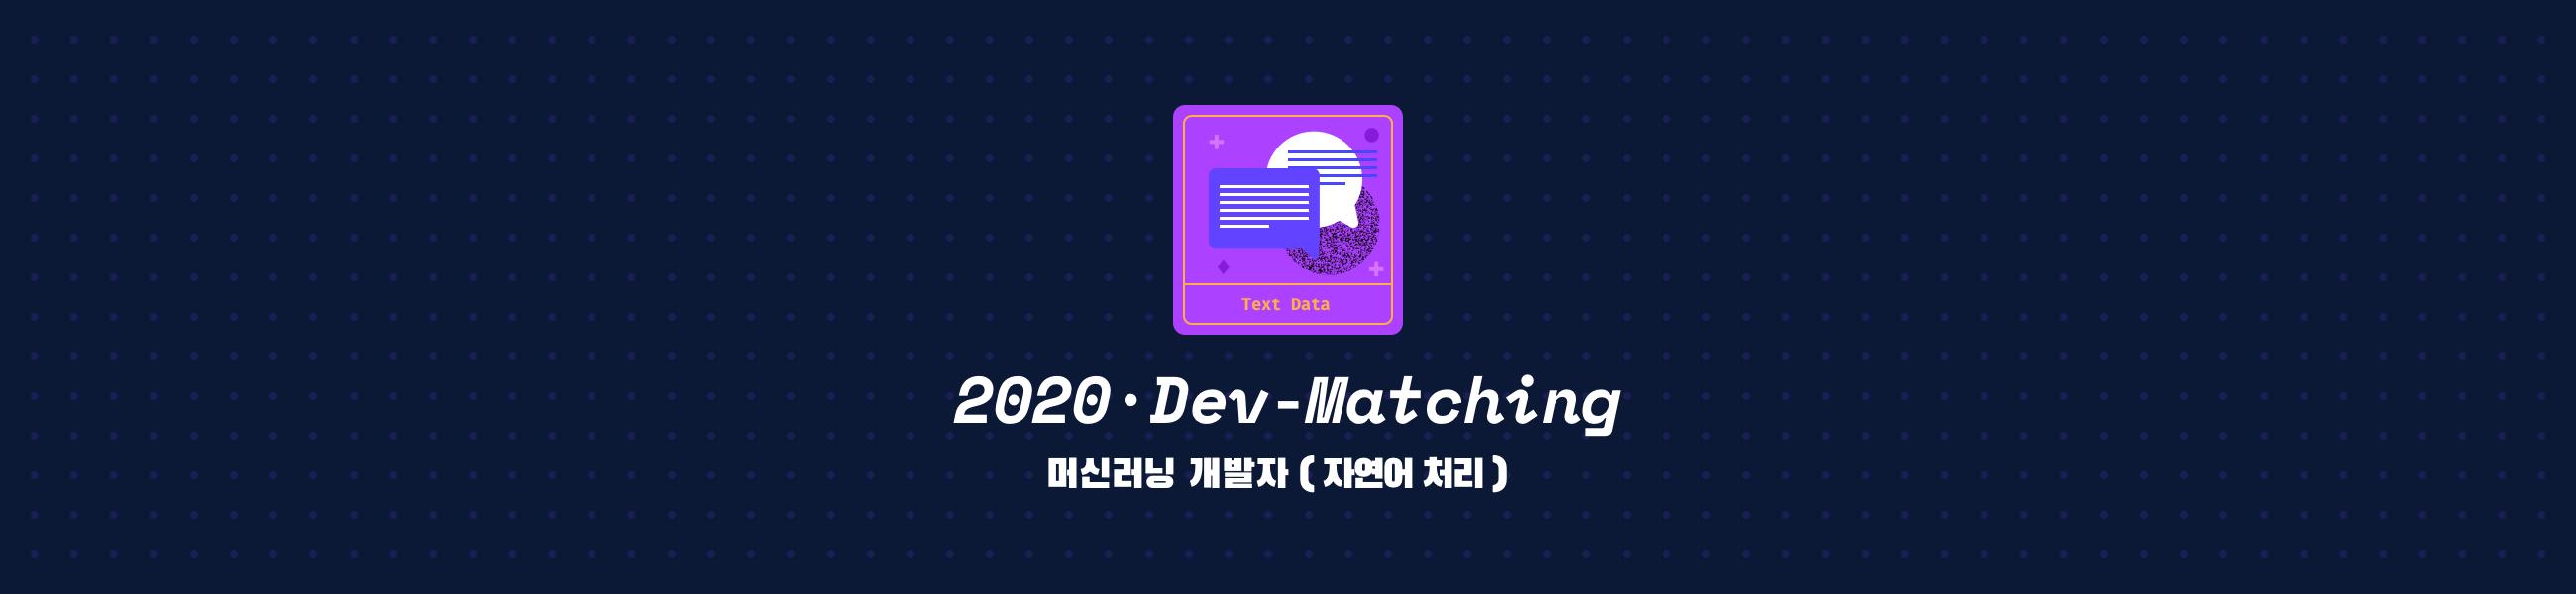 2020 Dev-Matching : 머신러닝(자연어 처리) 개발자의 이미지